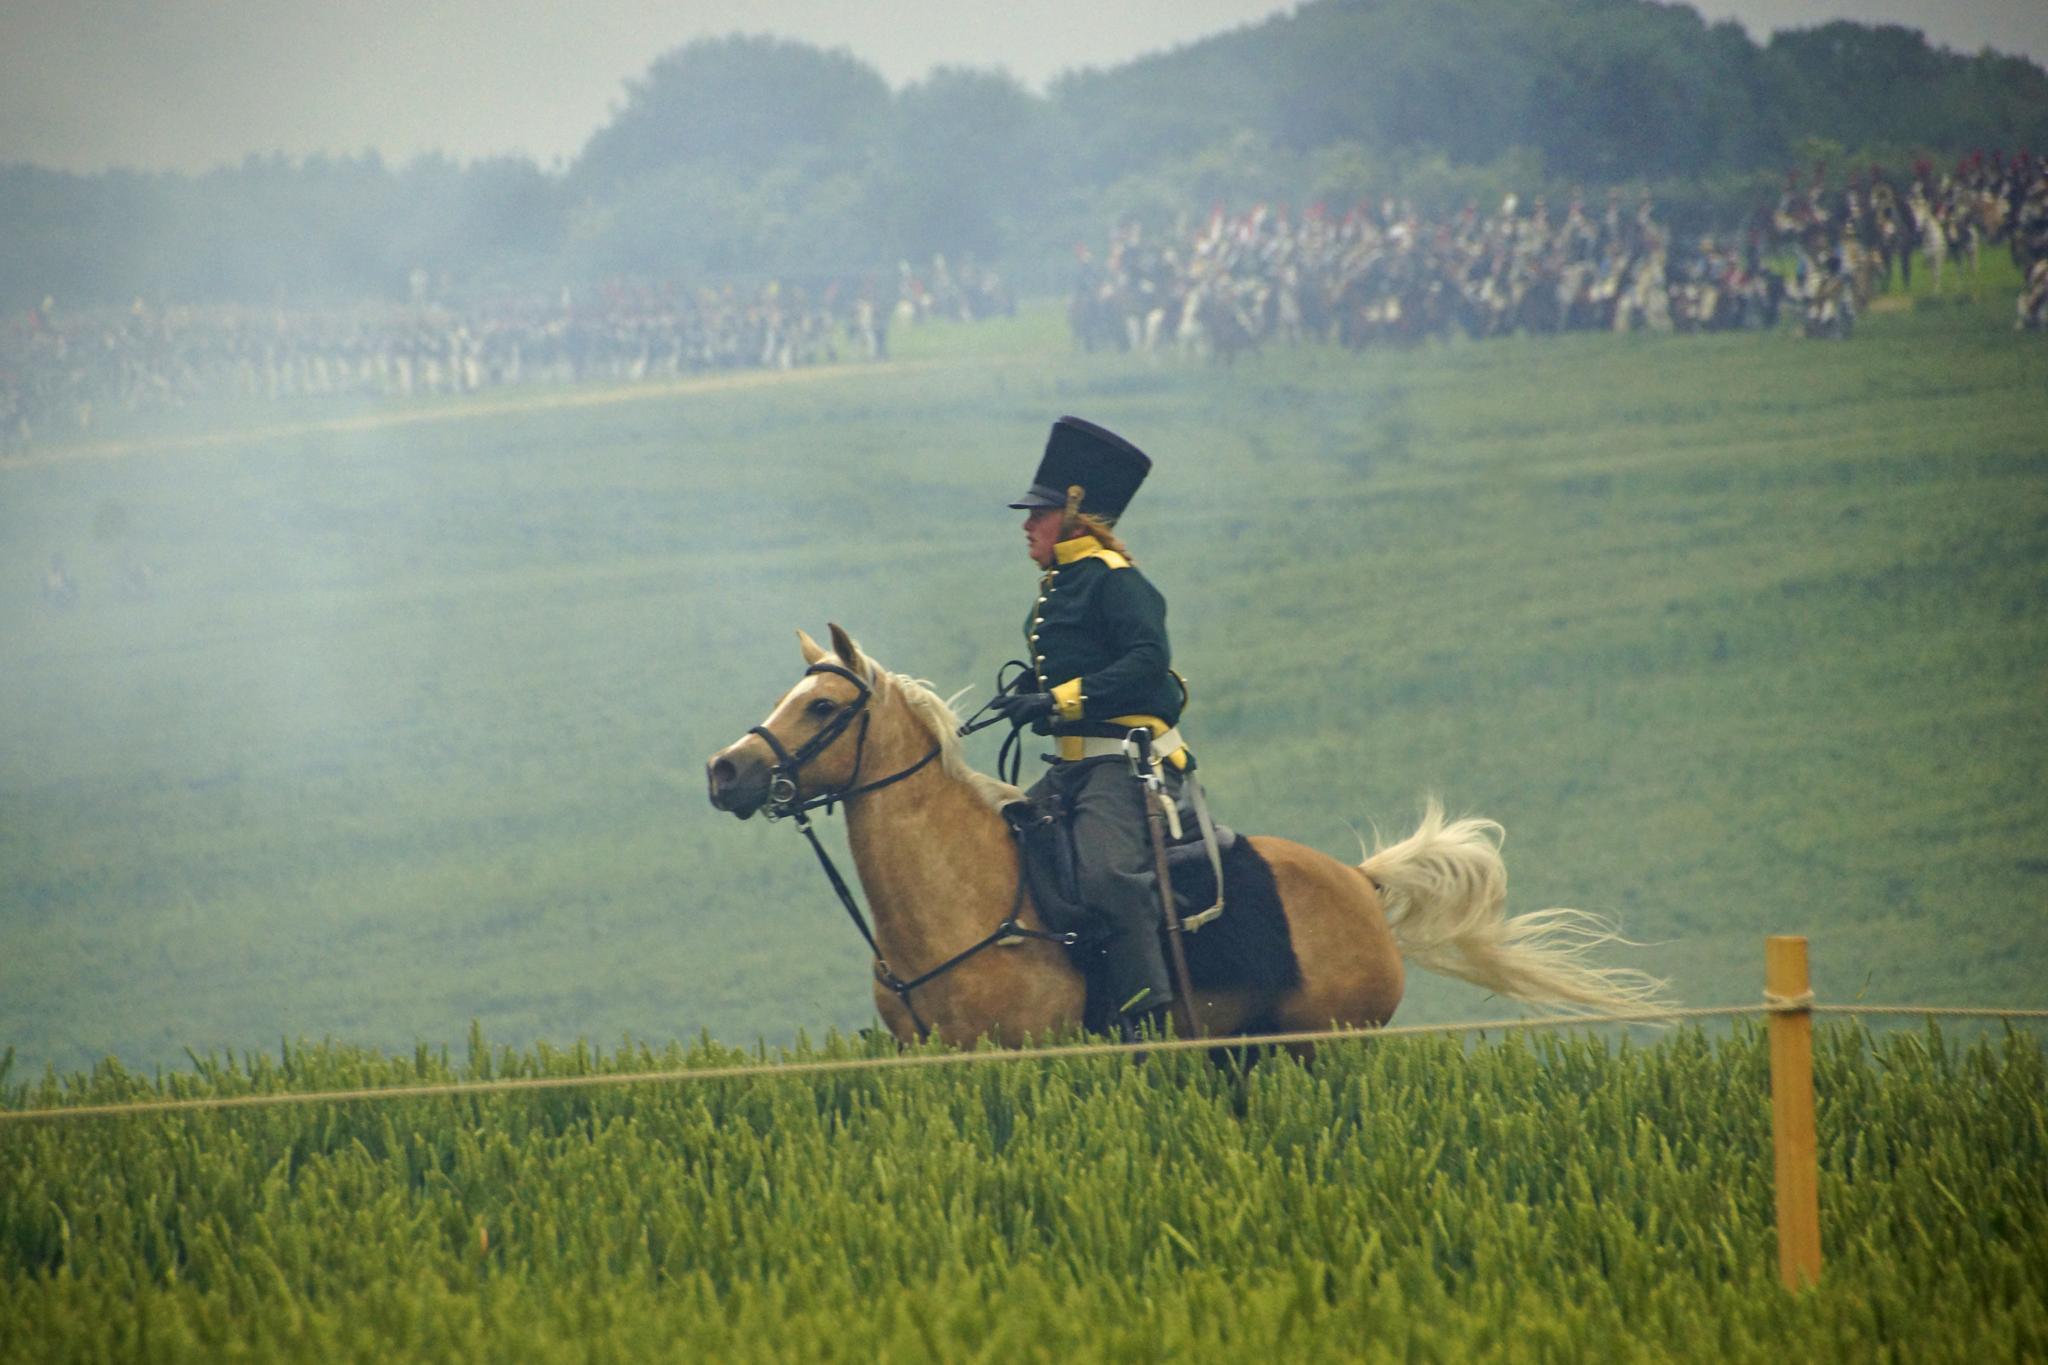 Waterloo Battle reenactment by bechara.yared